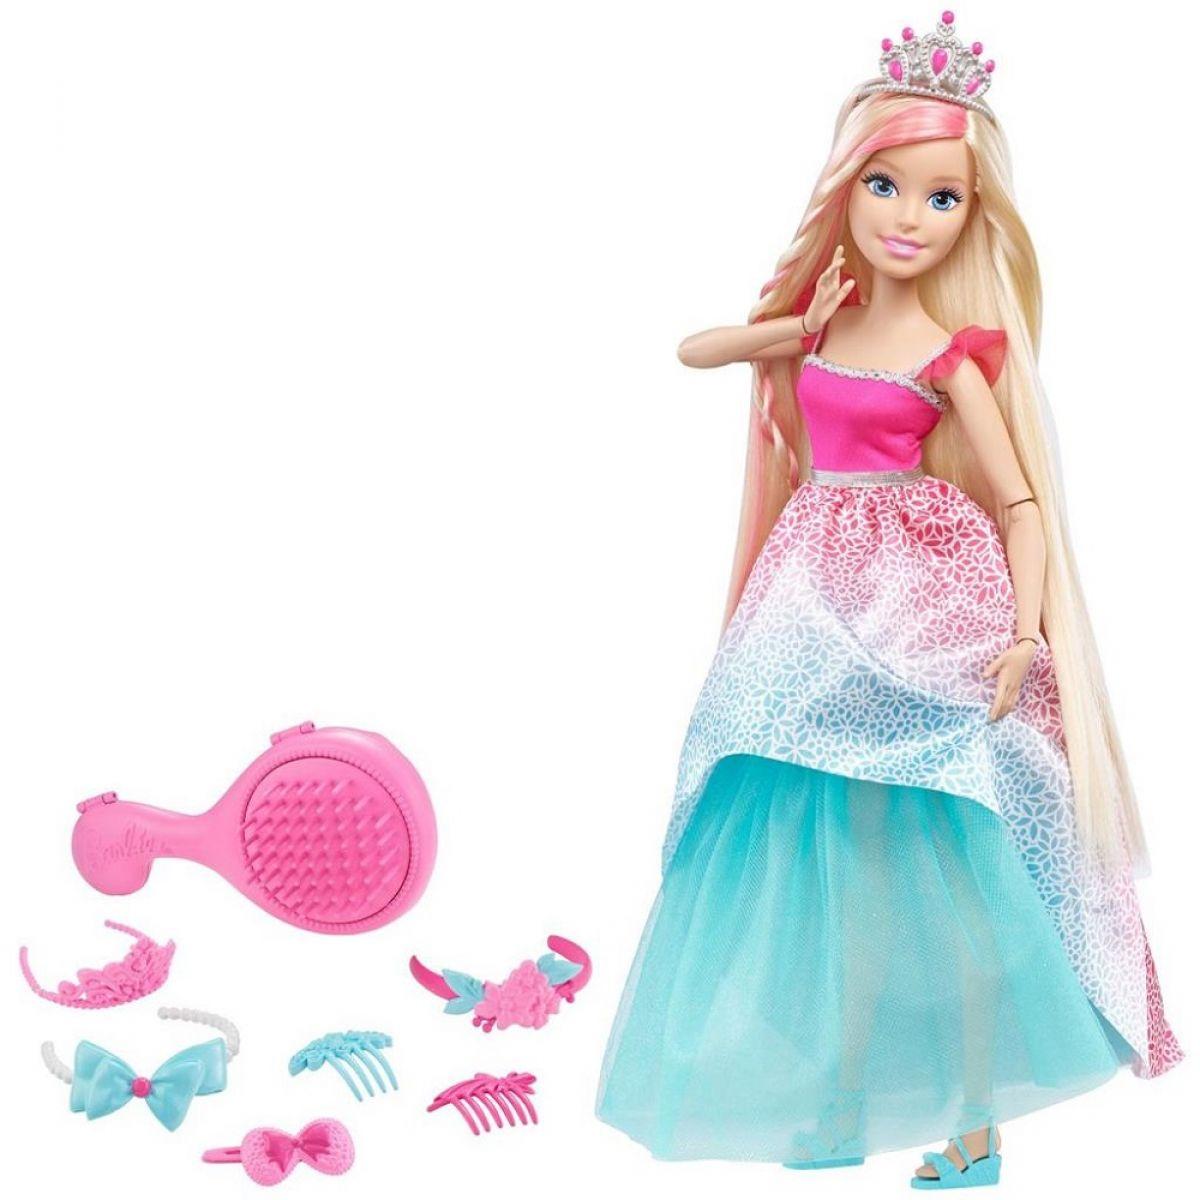 MATTEL Barbie Princezna Blondýnka s dlouhými vlasy 43 cm